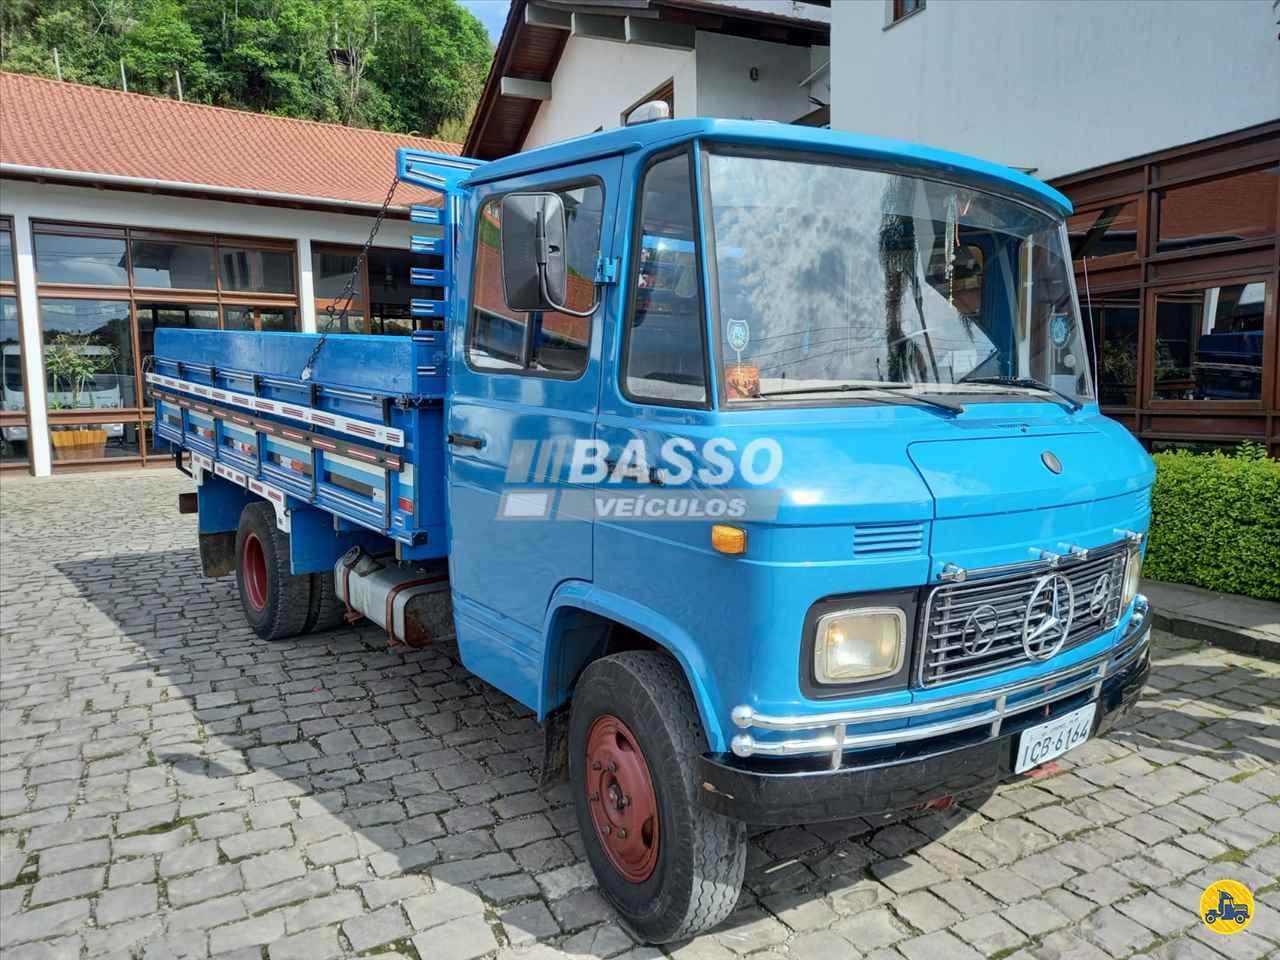 CAMINHAO MERCEDES-BENZ MB 608 Carga Seca 3/4 4x2 Basso Veículos GARIBALDI RIO GRANDE DO SUL RS